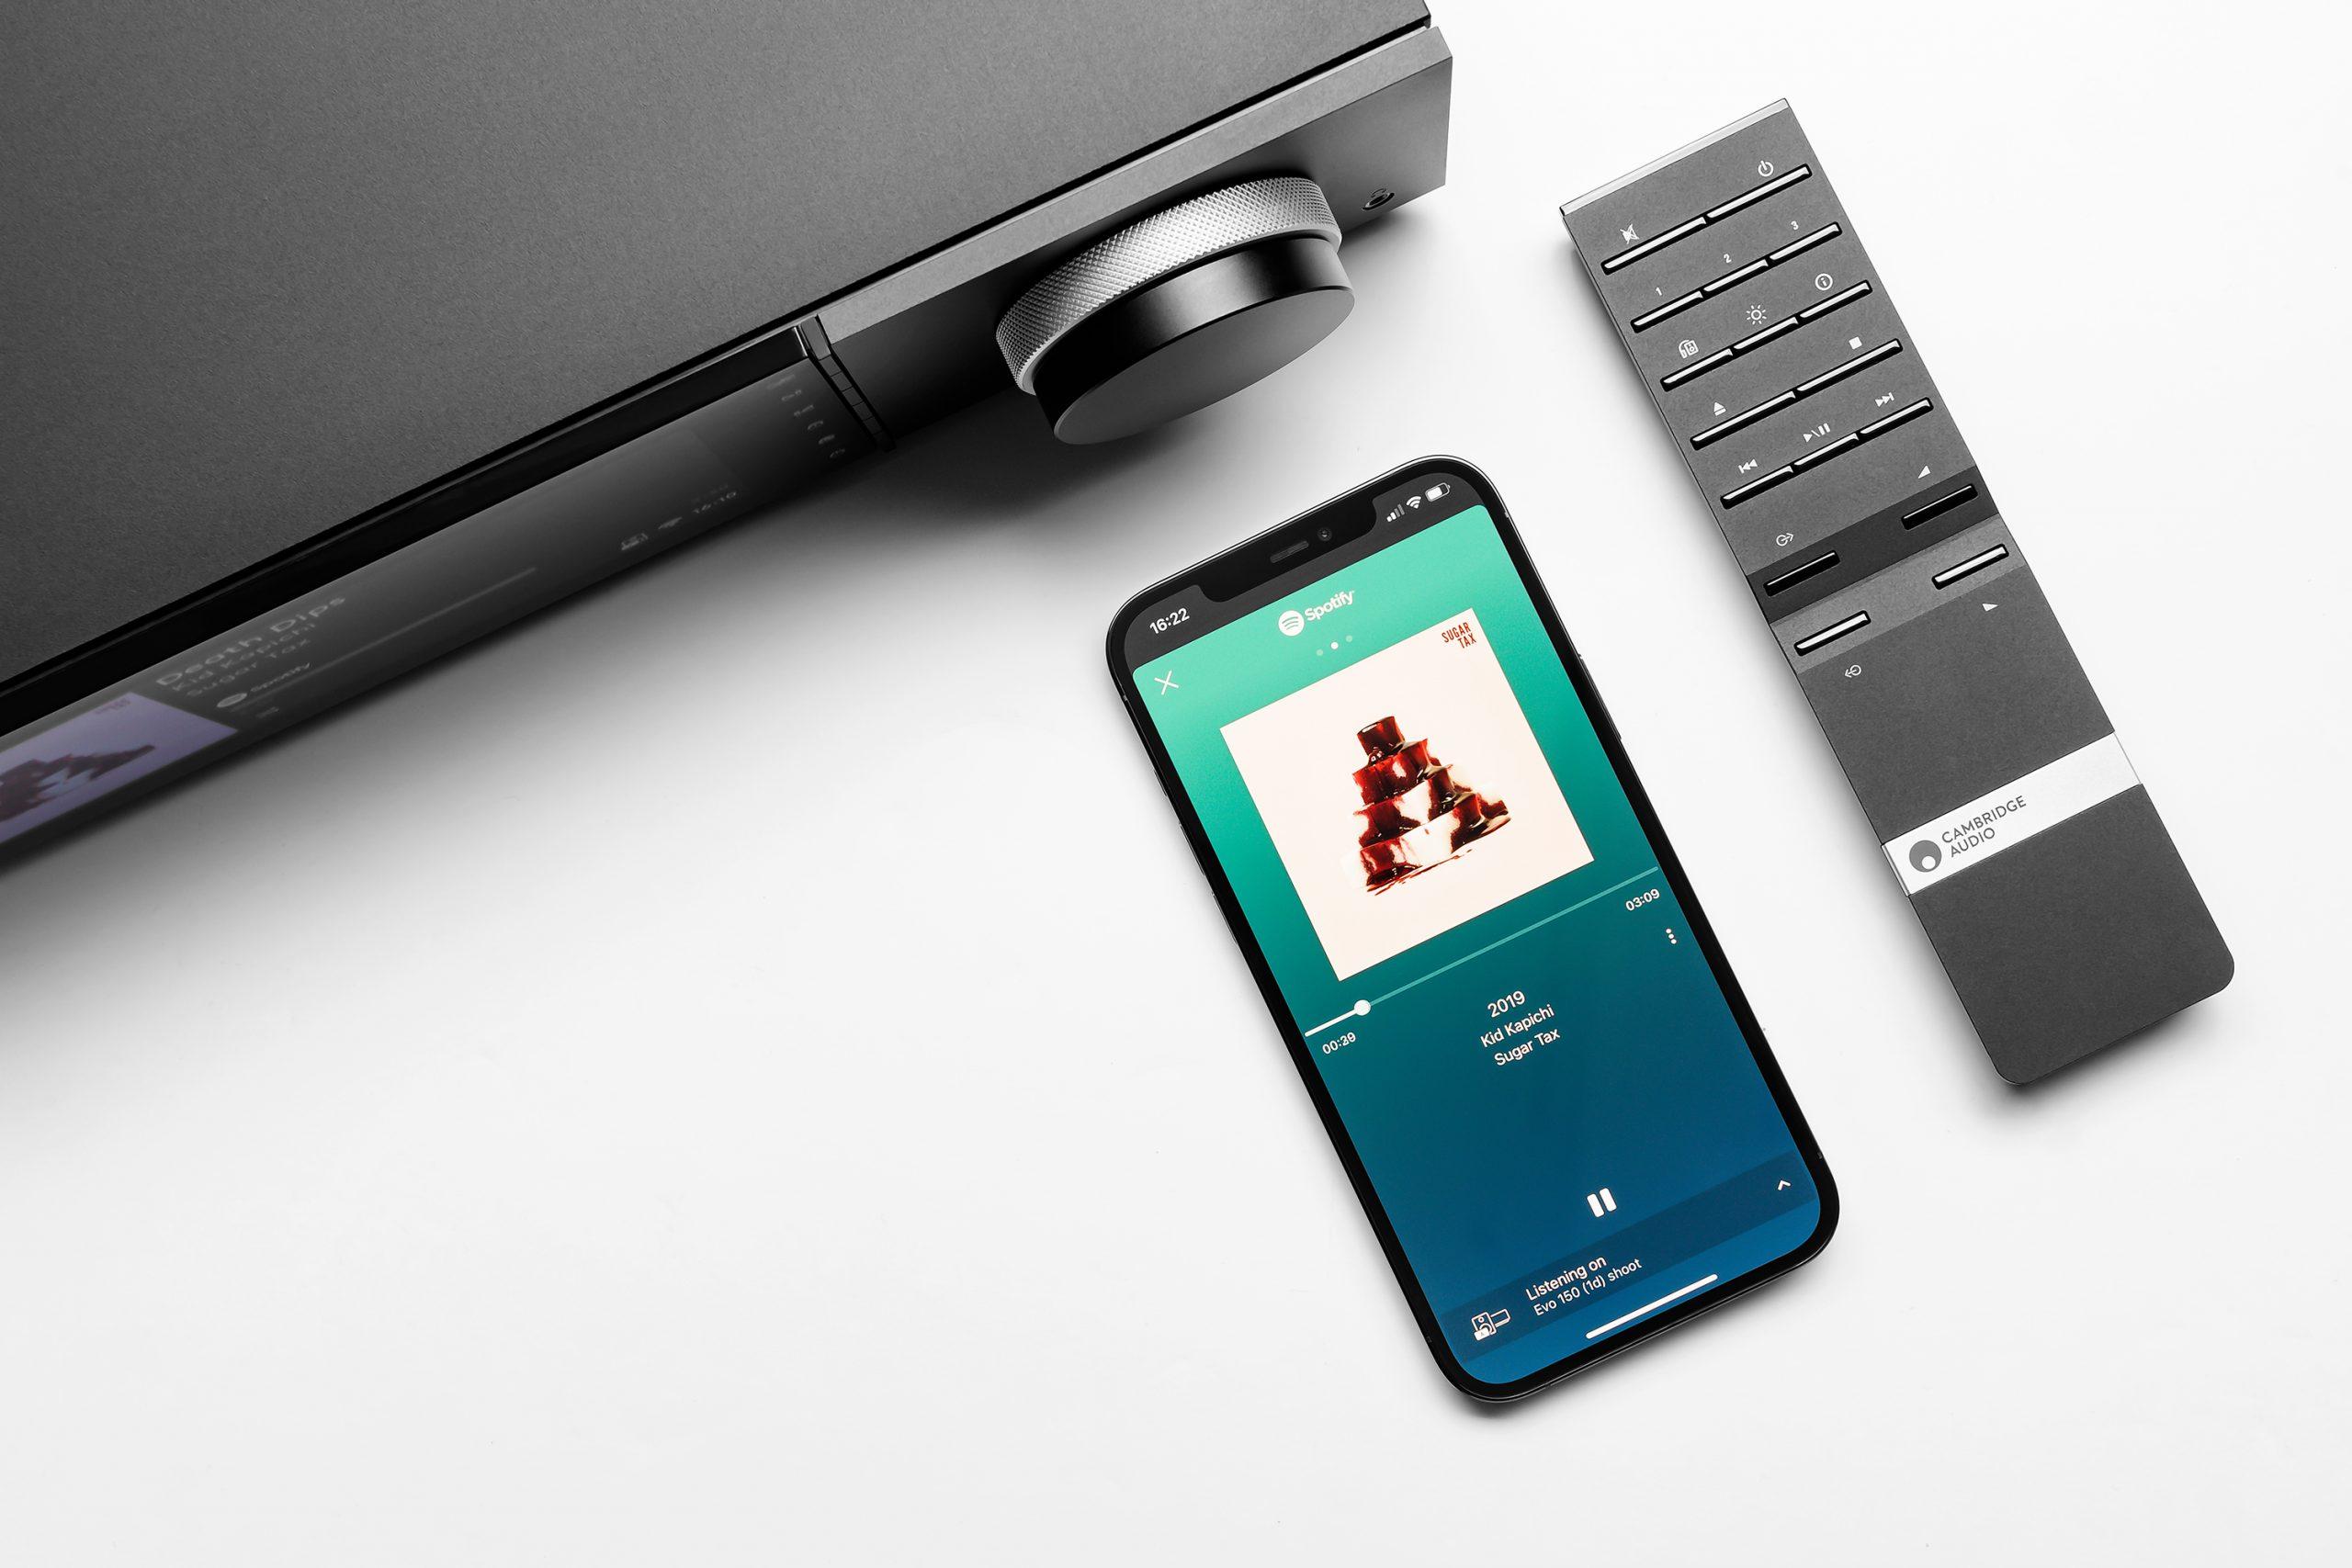 Cambridge Audio Evo remote & phone